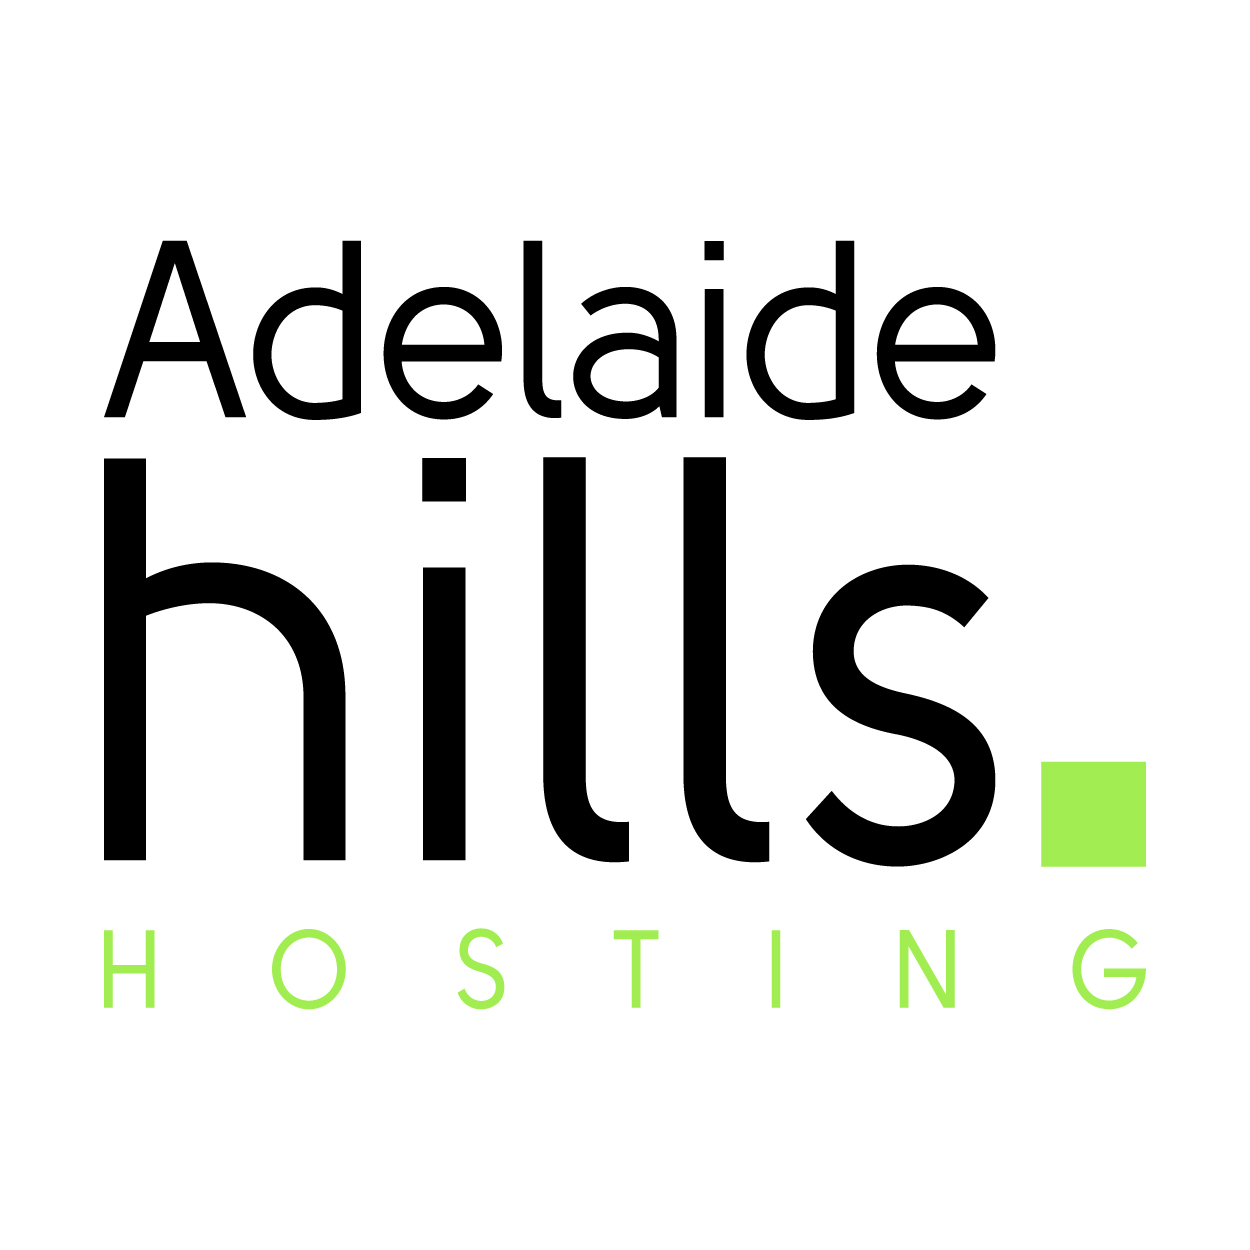 Adelaide Hills Hosting